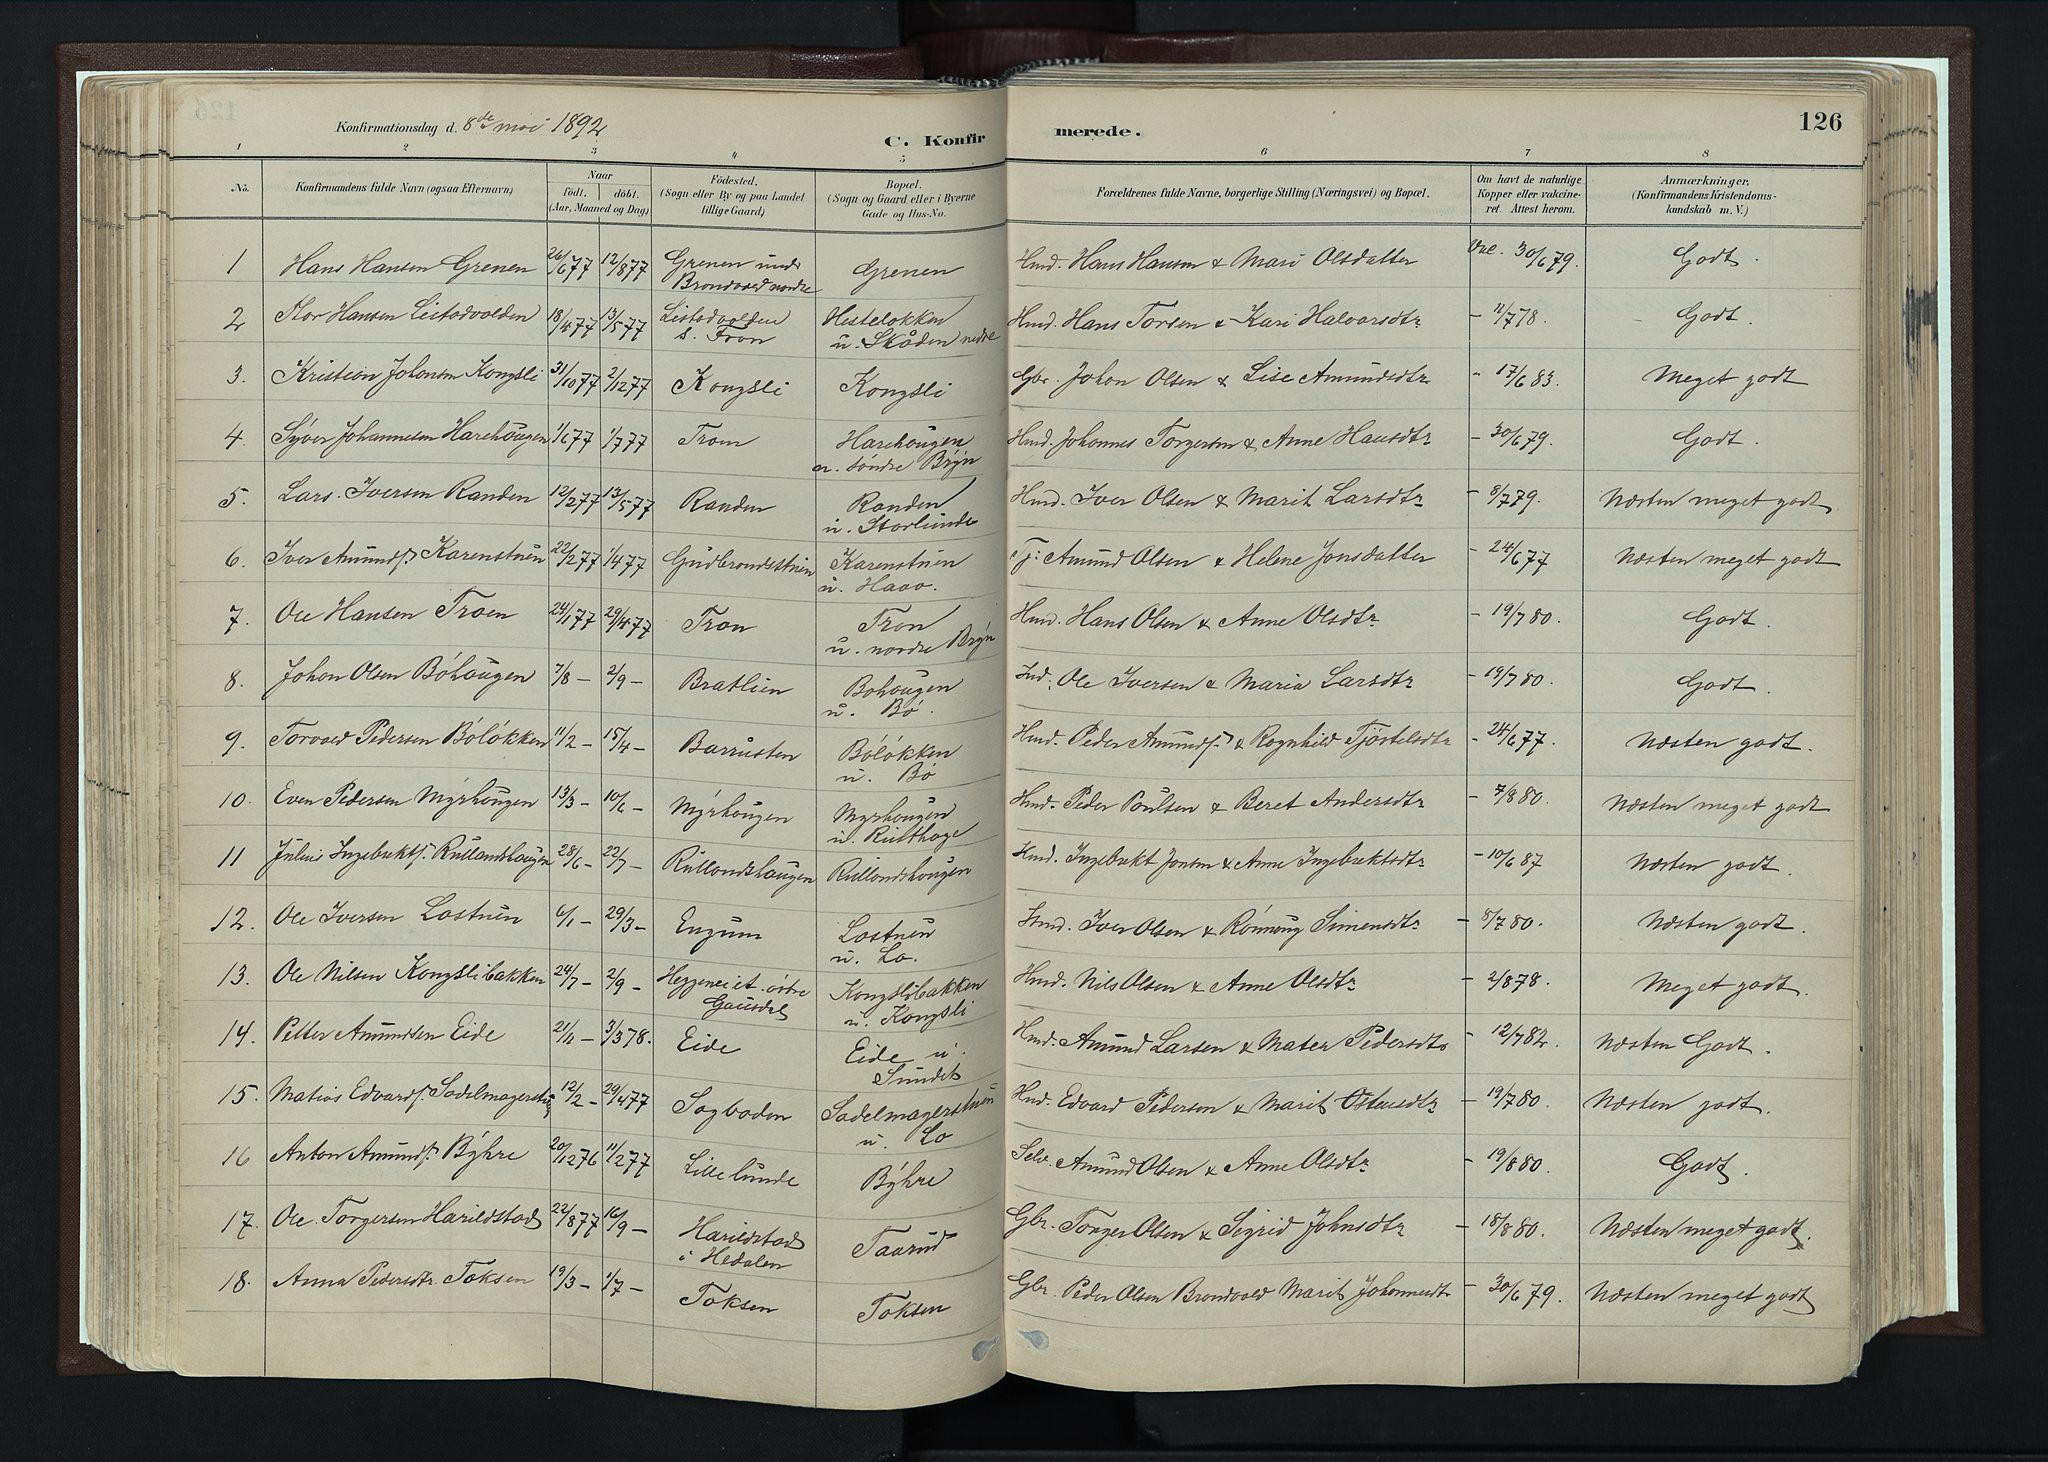 SAH, Nord-Fron prestekontor, Ministerialbok nr. 4, 1884-1914, s. 126